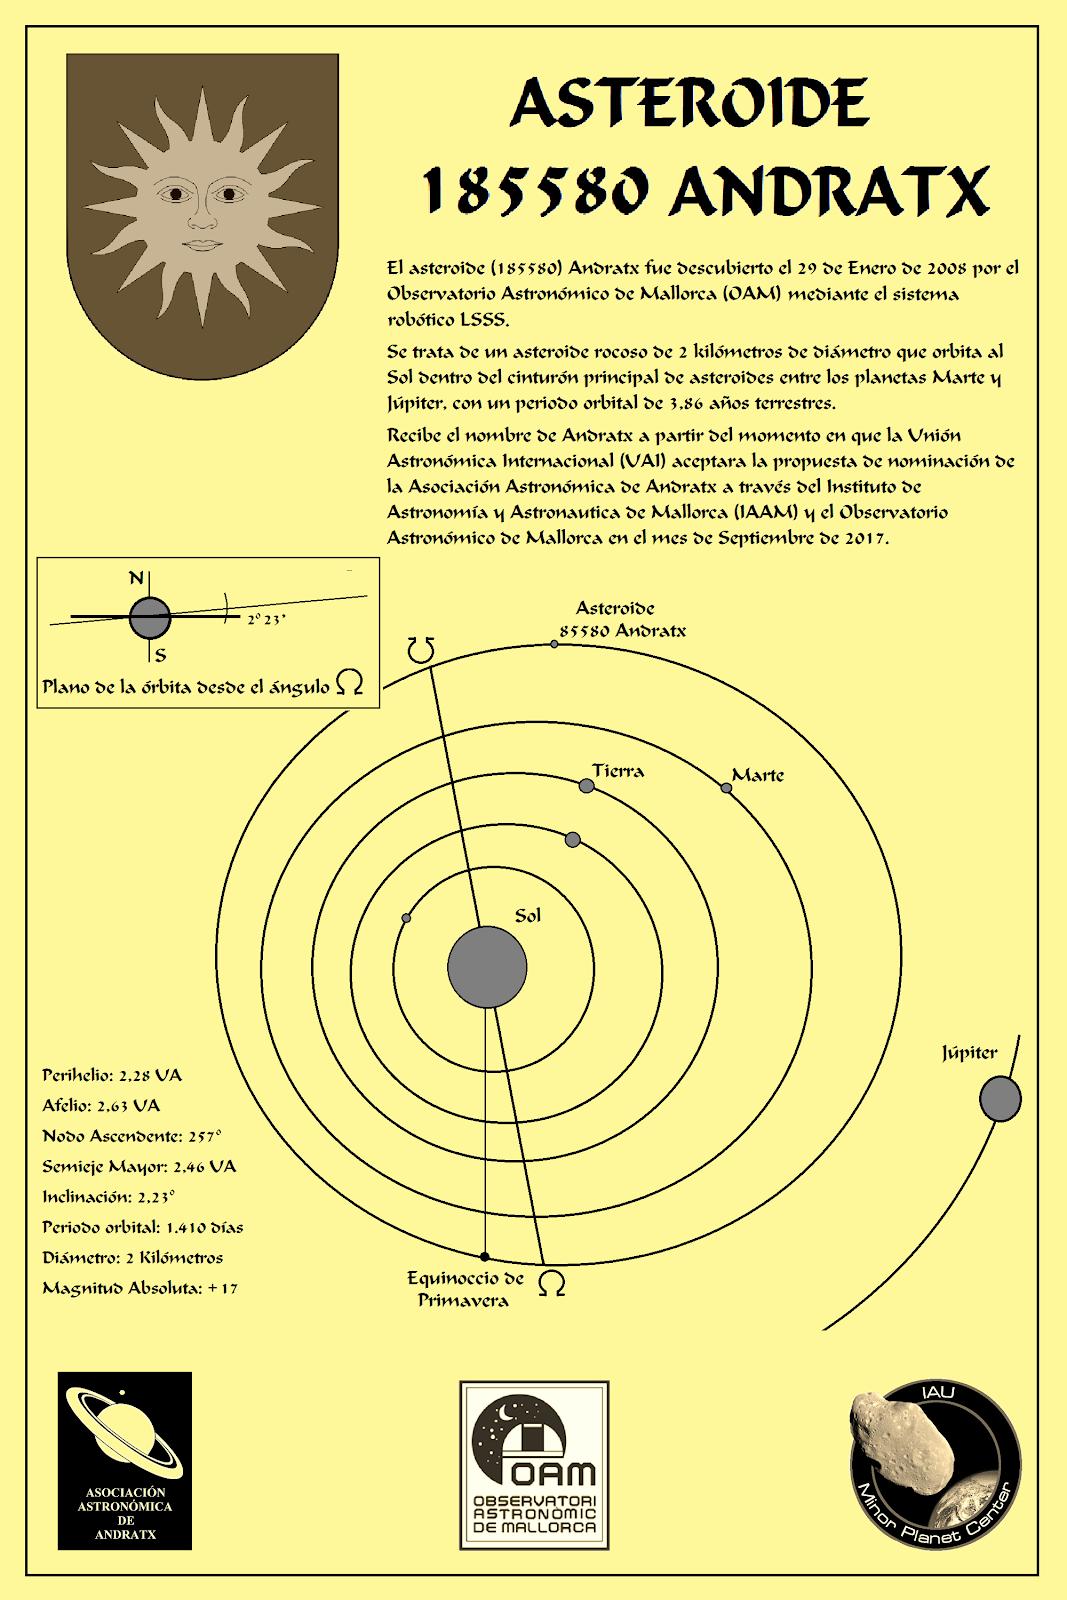 Asteroide (185580) ANDRATX